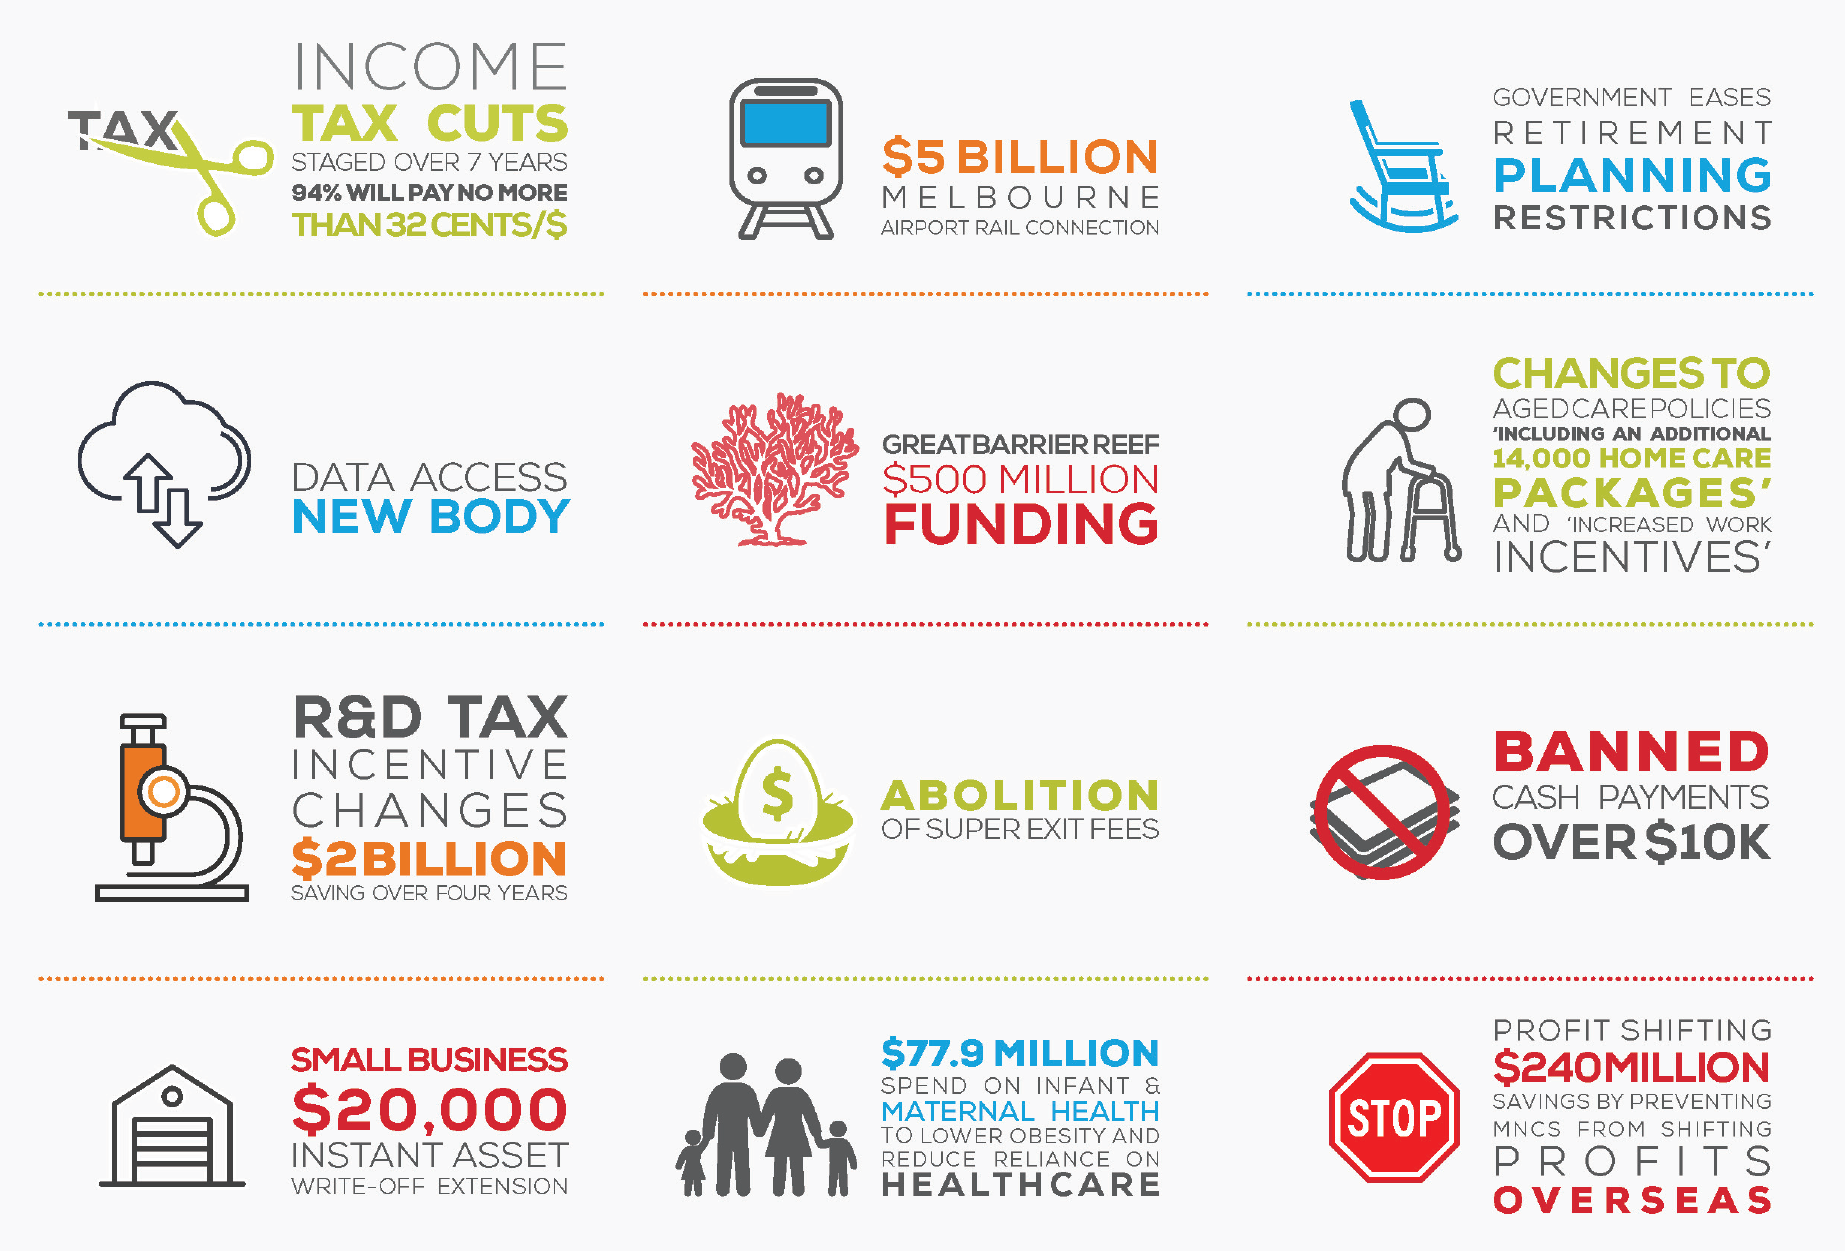 662_Australian_Federal_Budget_Infographic_v5-01.png